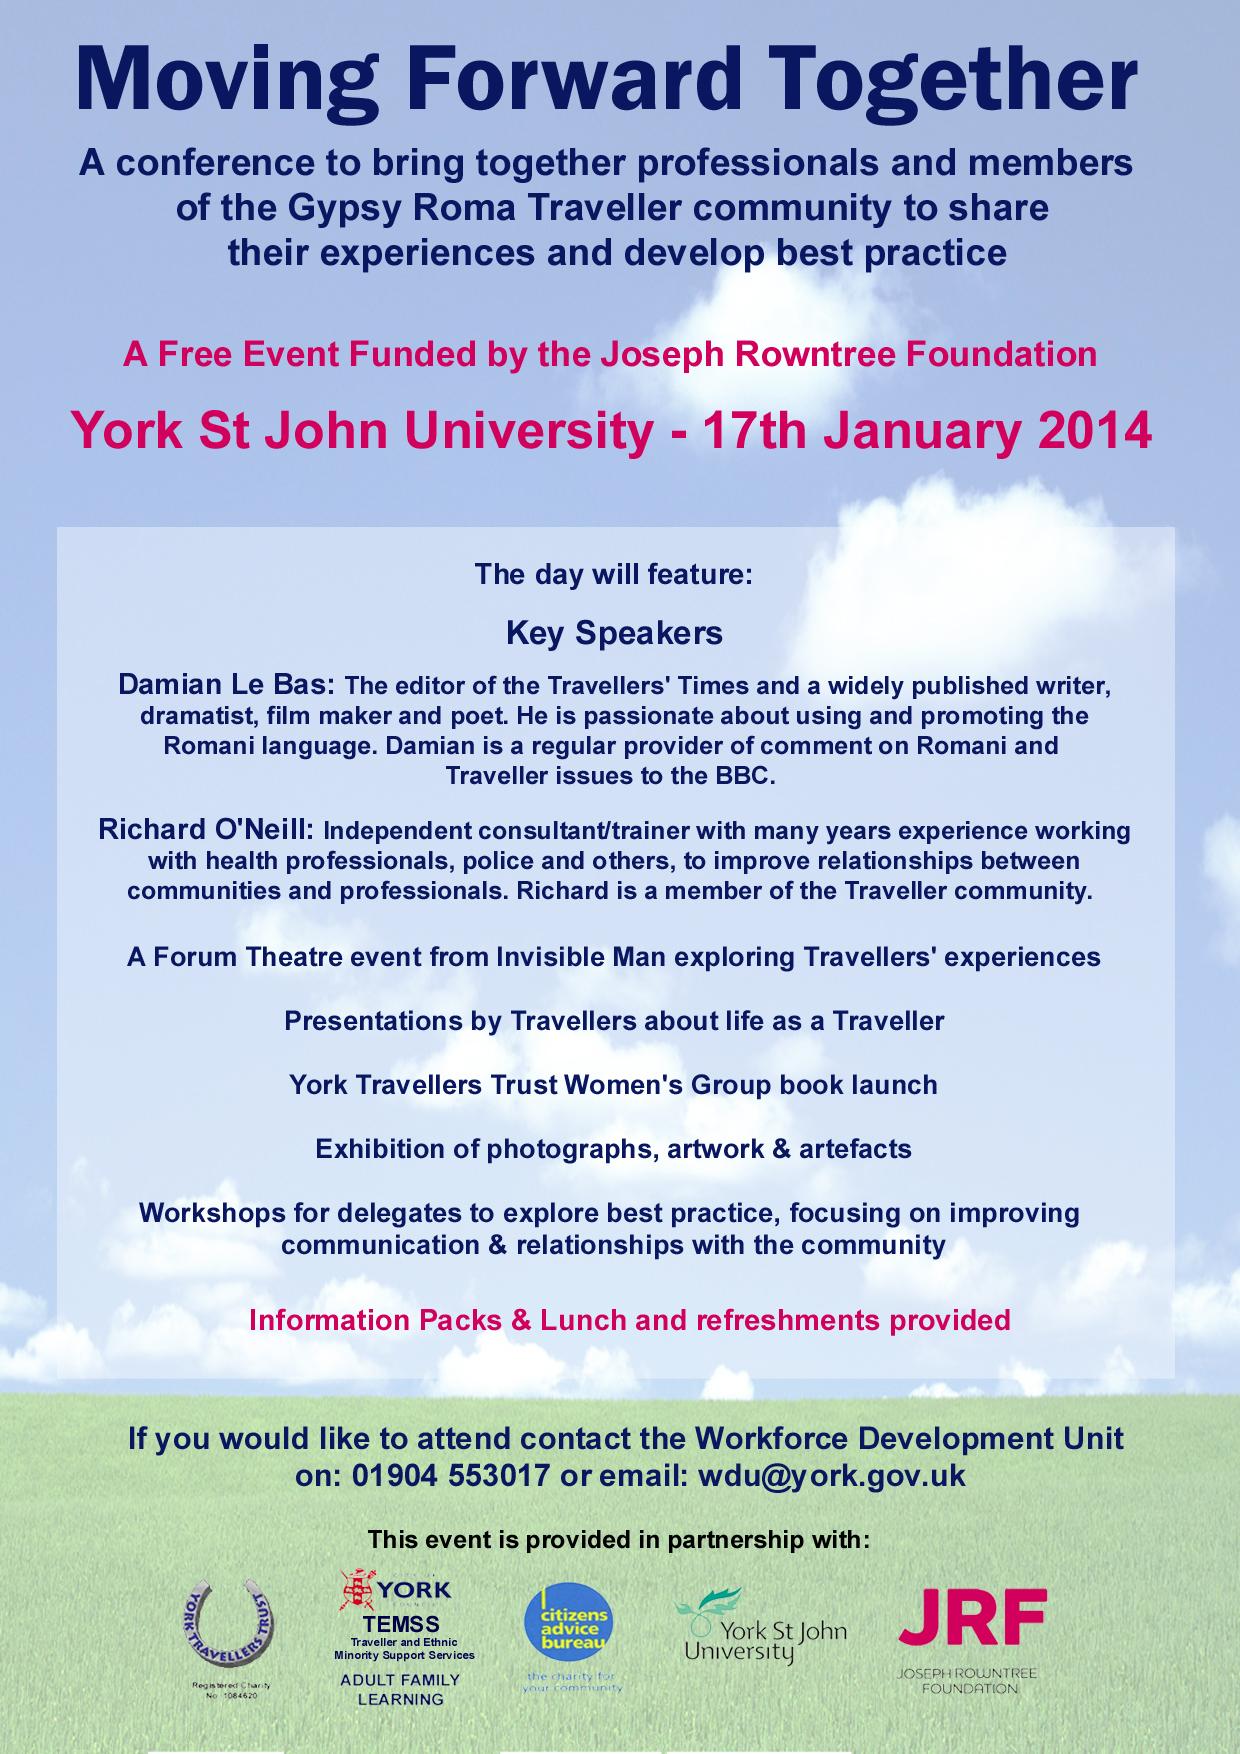 Moving Forward Together Conference2014